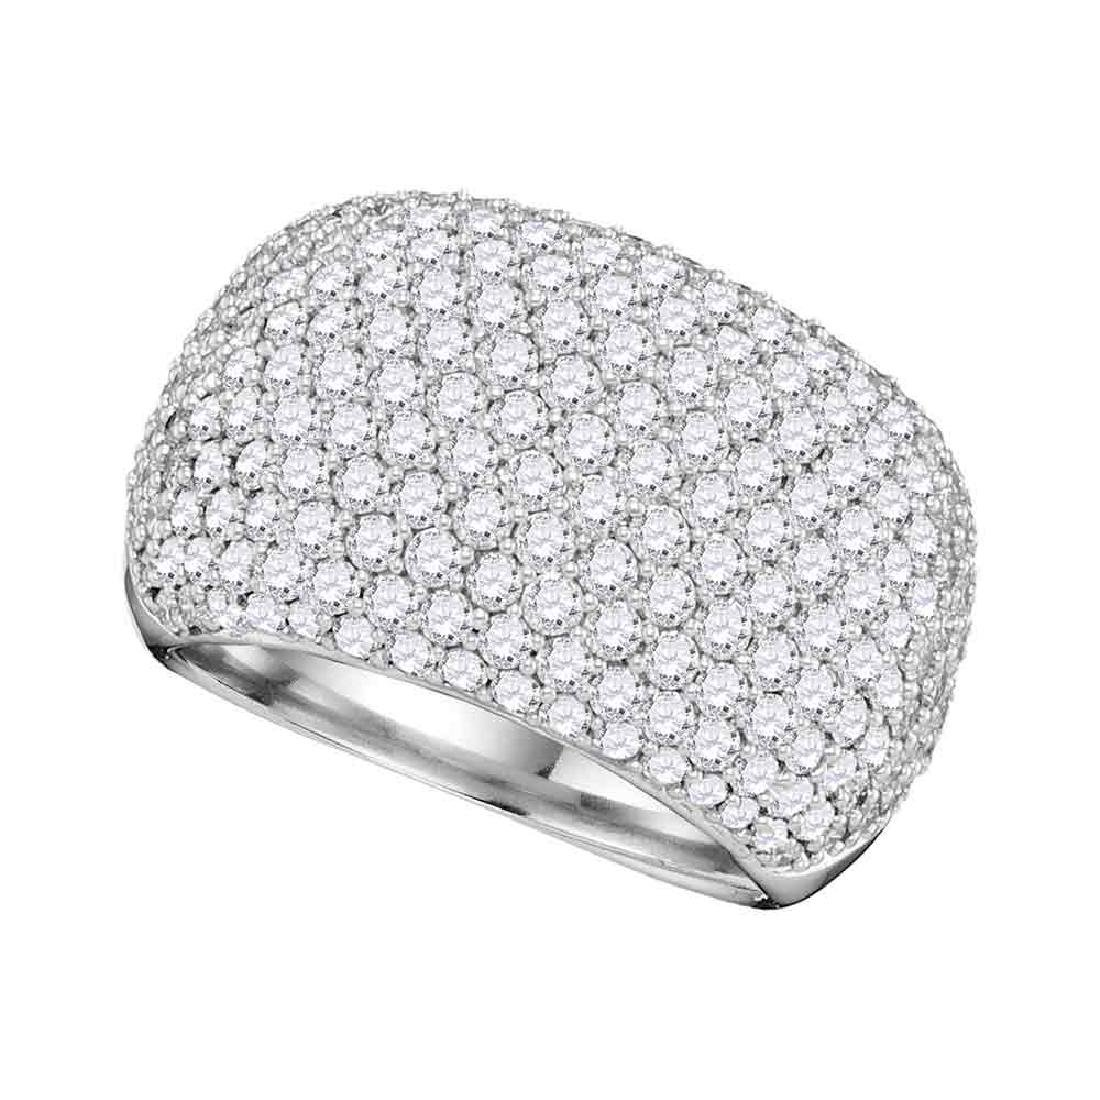 2.8 CTW Diamond Ring 14KT White Gold - REF-420X2Y